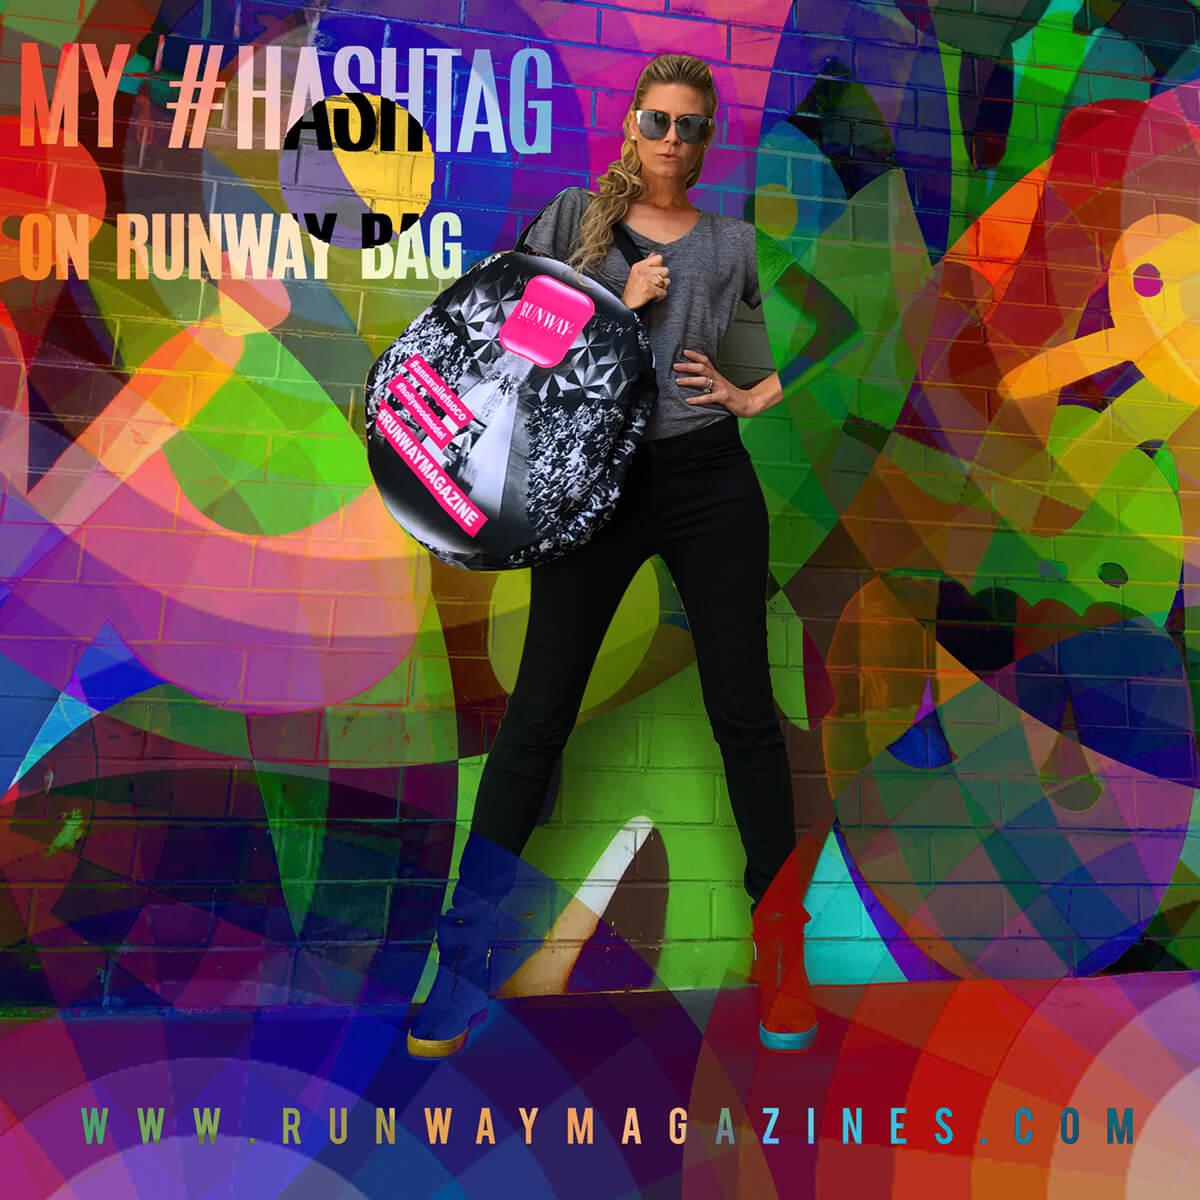 "Story of Fashion Model - My Runway Bag <a href=""https://runwaymagazines.com"">RUNWAY MAGAZINE </a>"